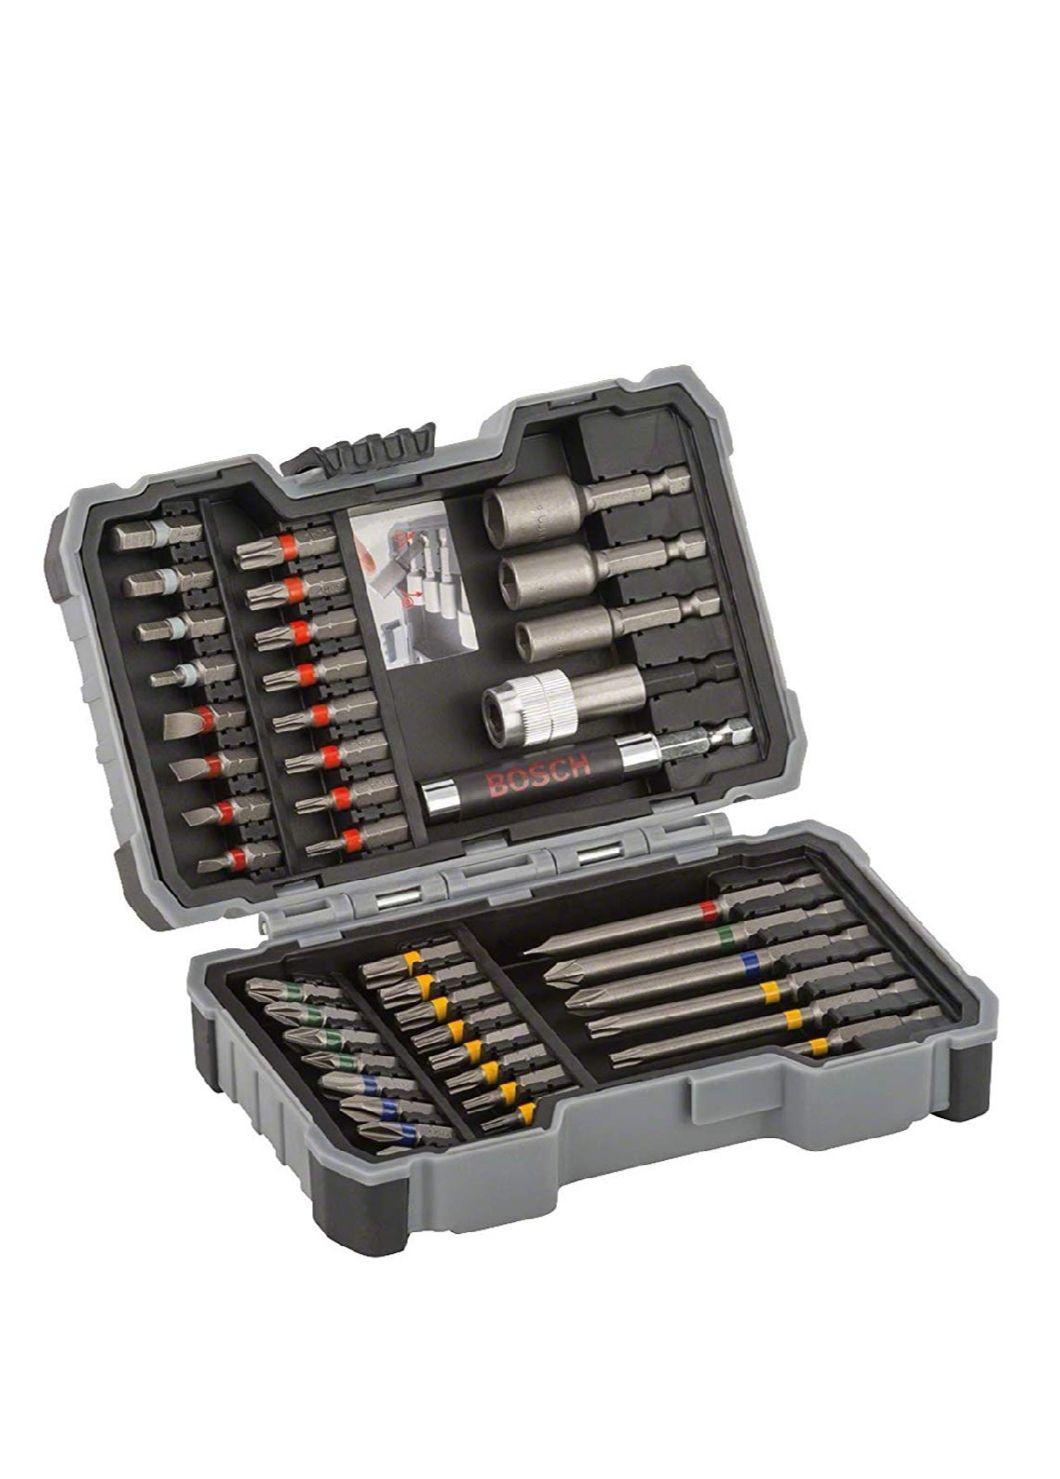 Bosch Professional 2607017164 43-Piece bit and nutsetter Set, Tools - £12.99 (Prime) £17.48 (Non Prime) @ Amazon